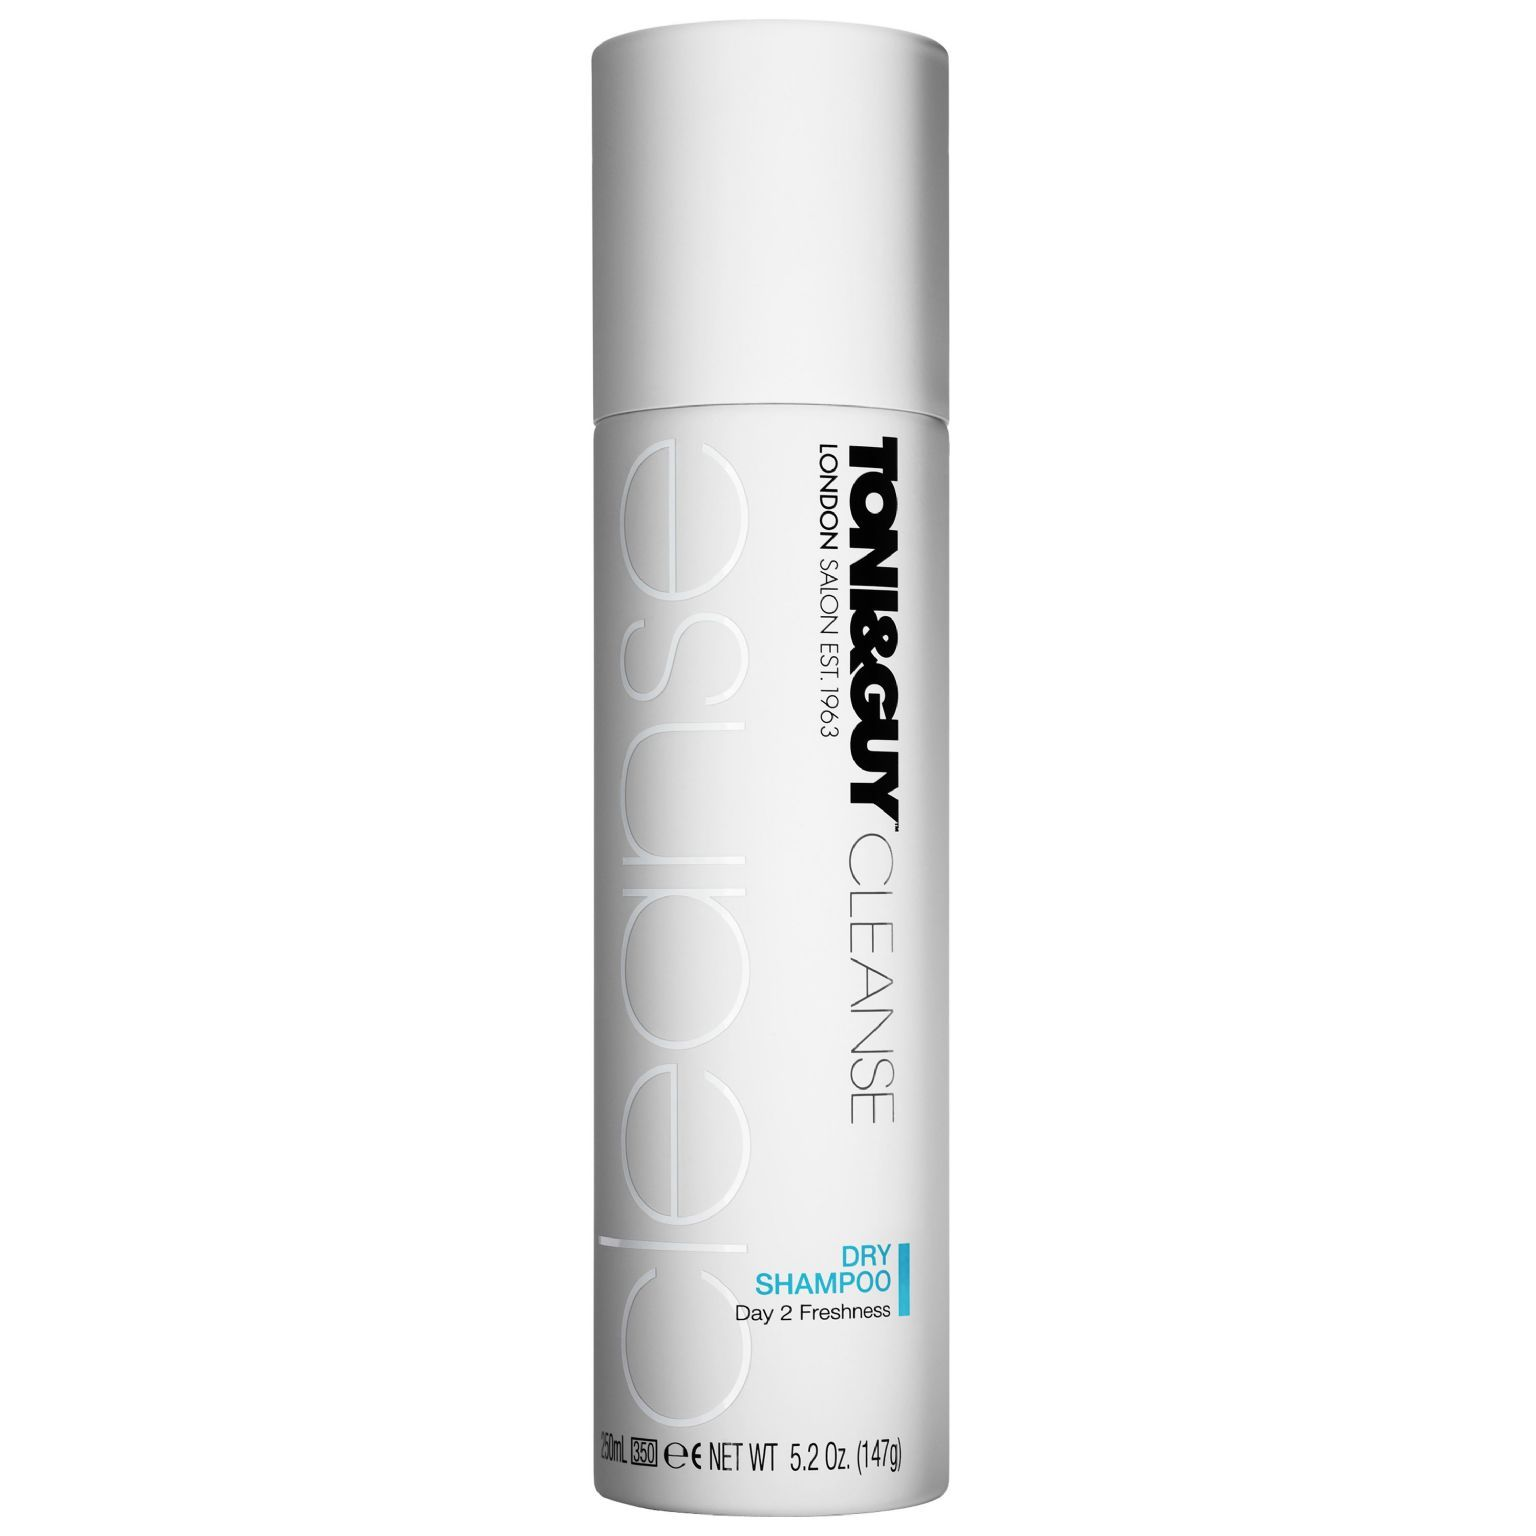 Cleanse Dry Shampoo